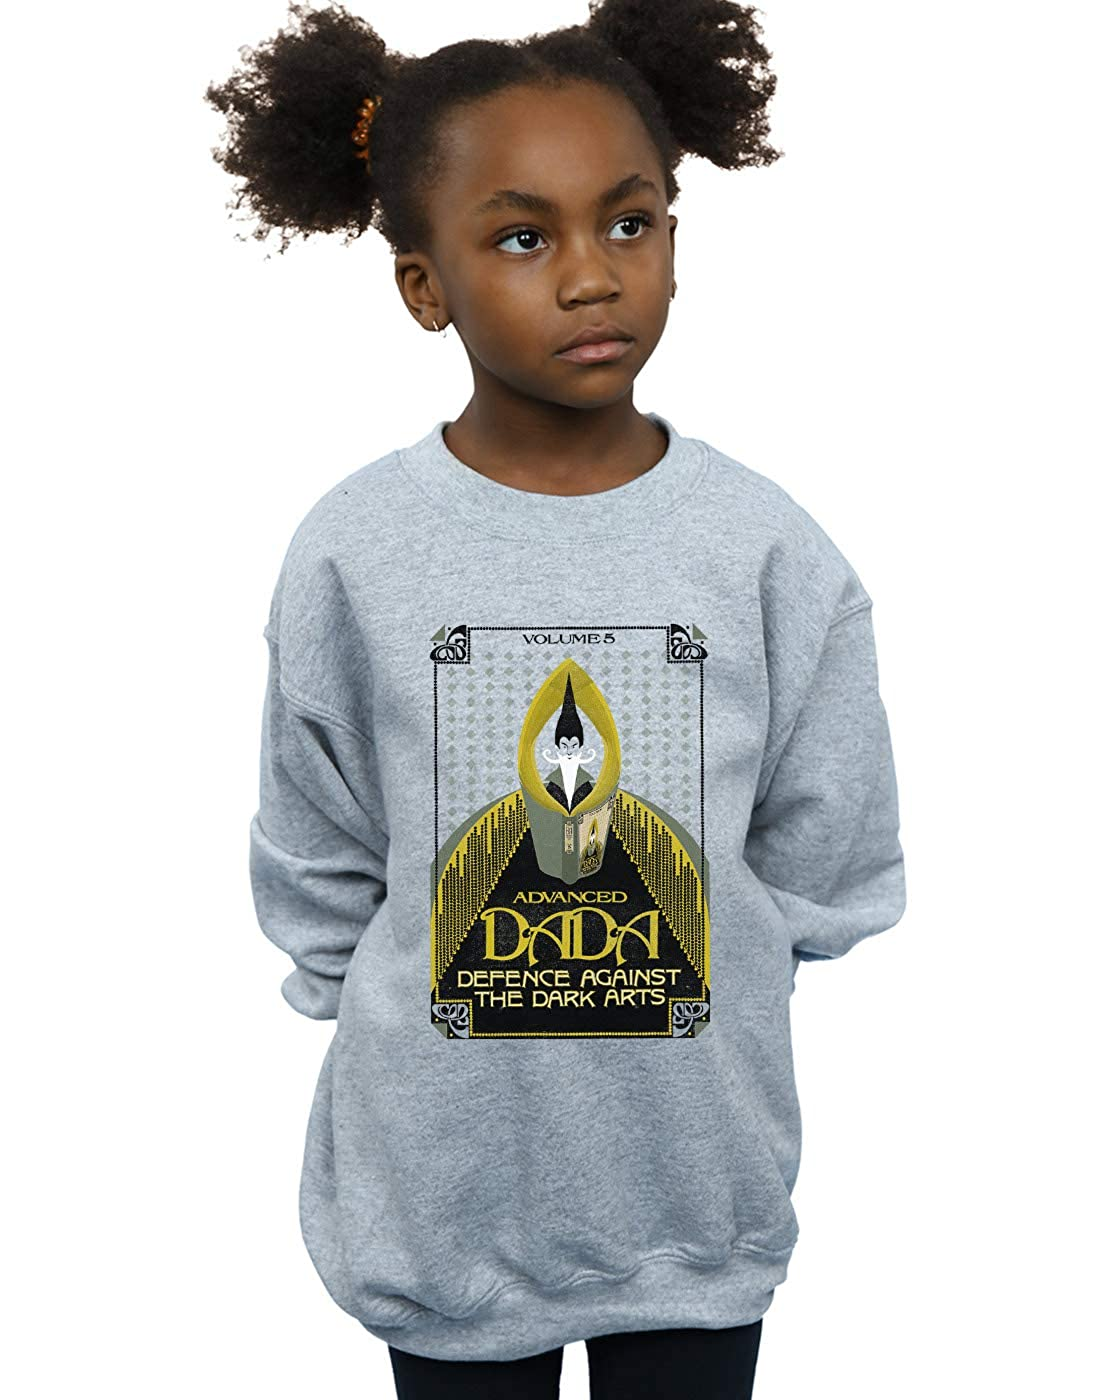 Absolute Cult Fantastic Beasts 2 Girls Advanced Dada Sweatshirt